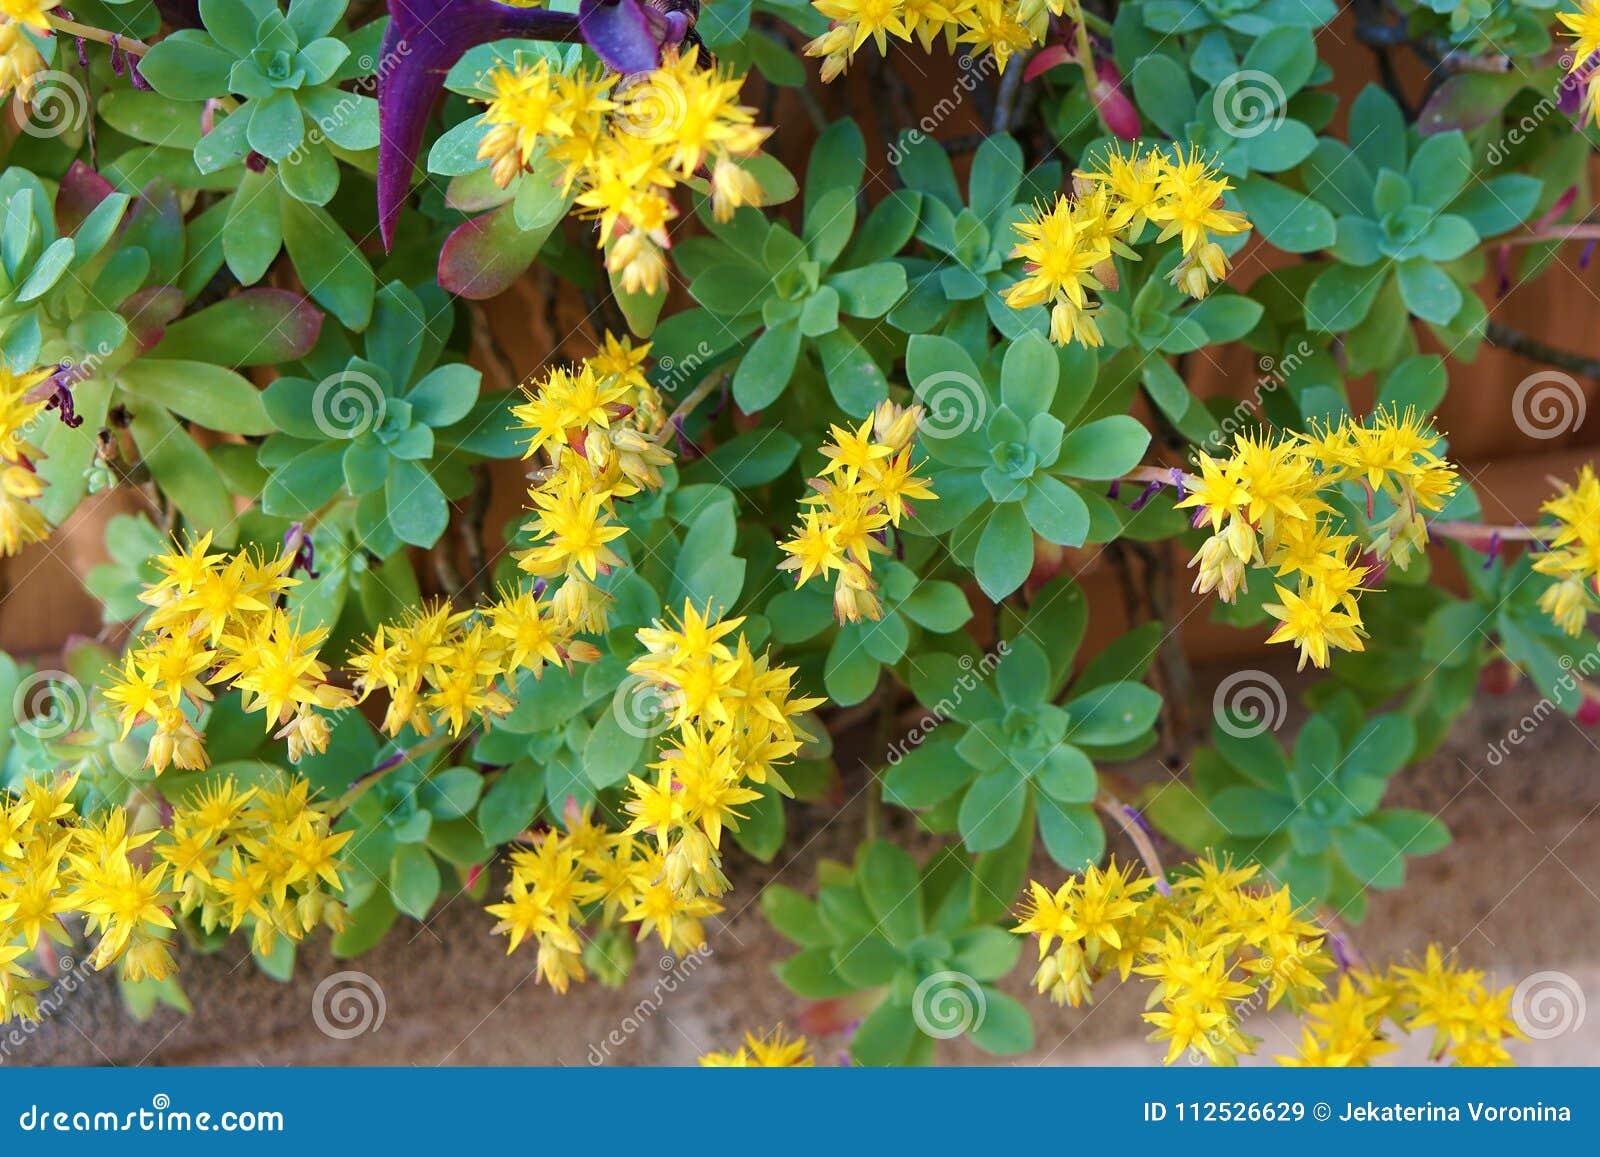 Plant with yellow flowersstonecropsedum palmeri stock image plant with yellow flowersstonecropsedum palmeri mightylinksfo